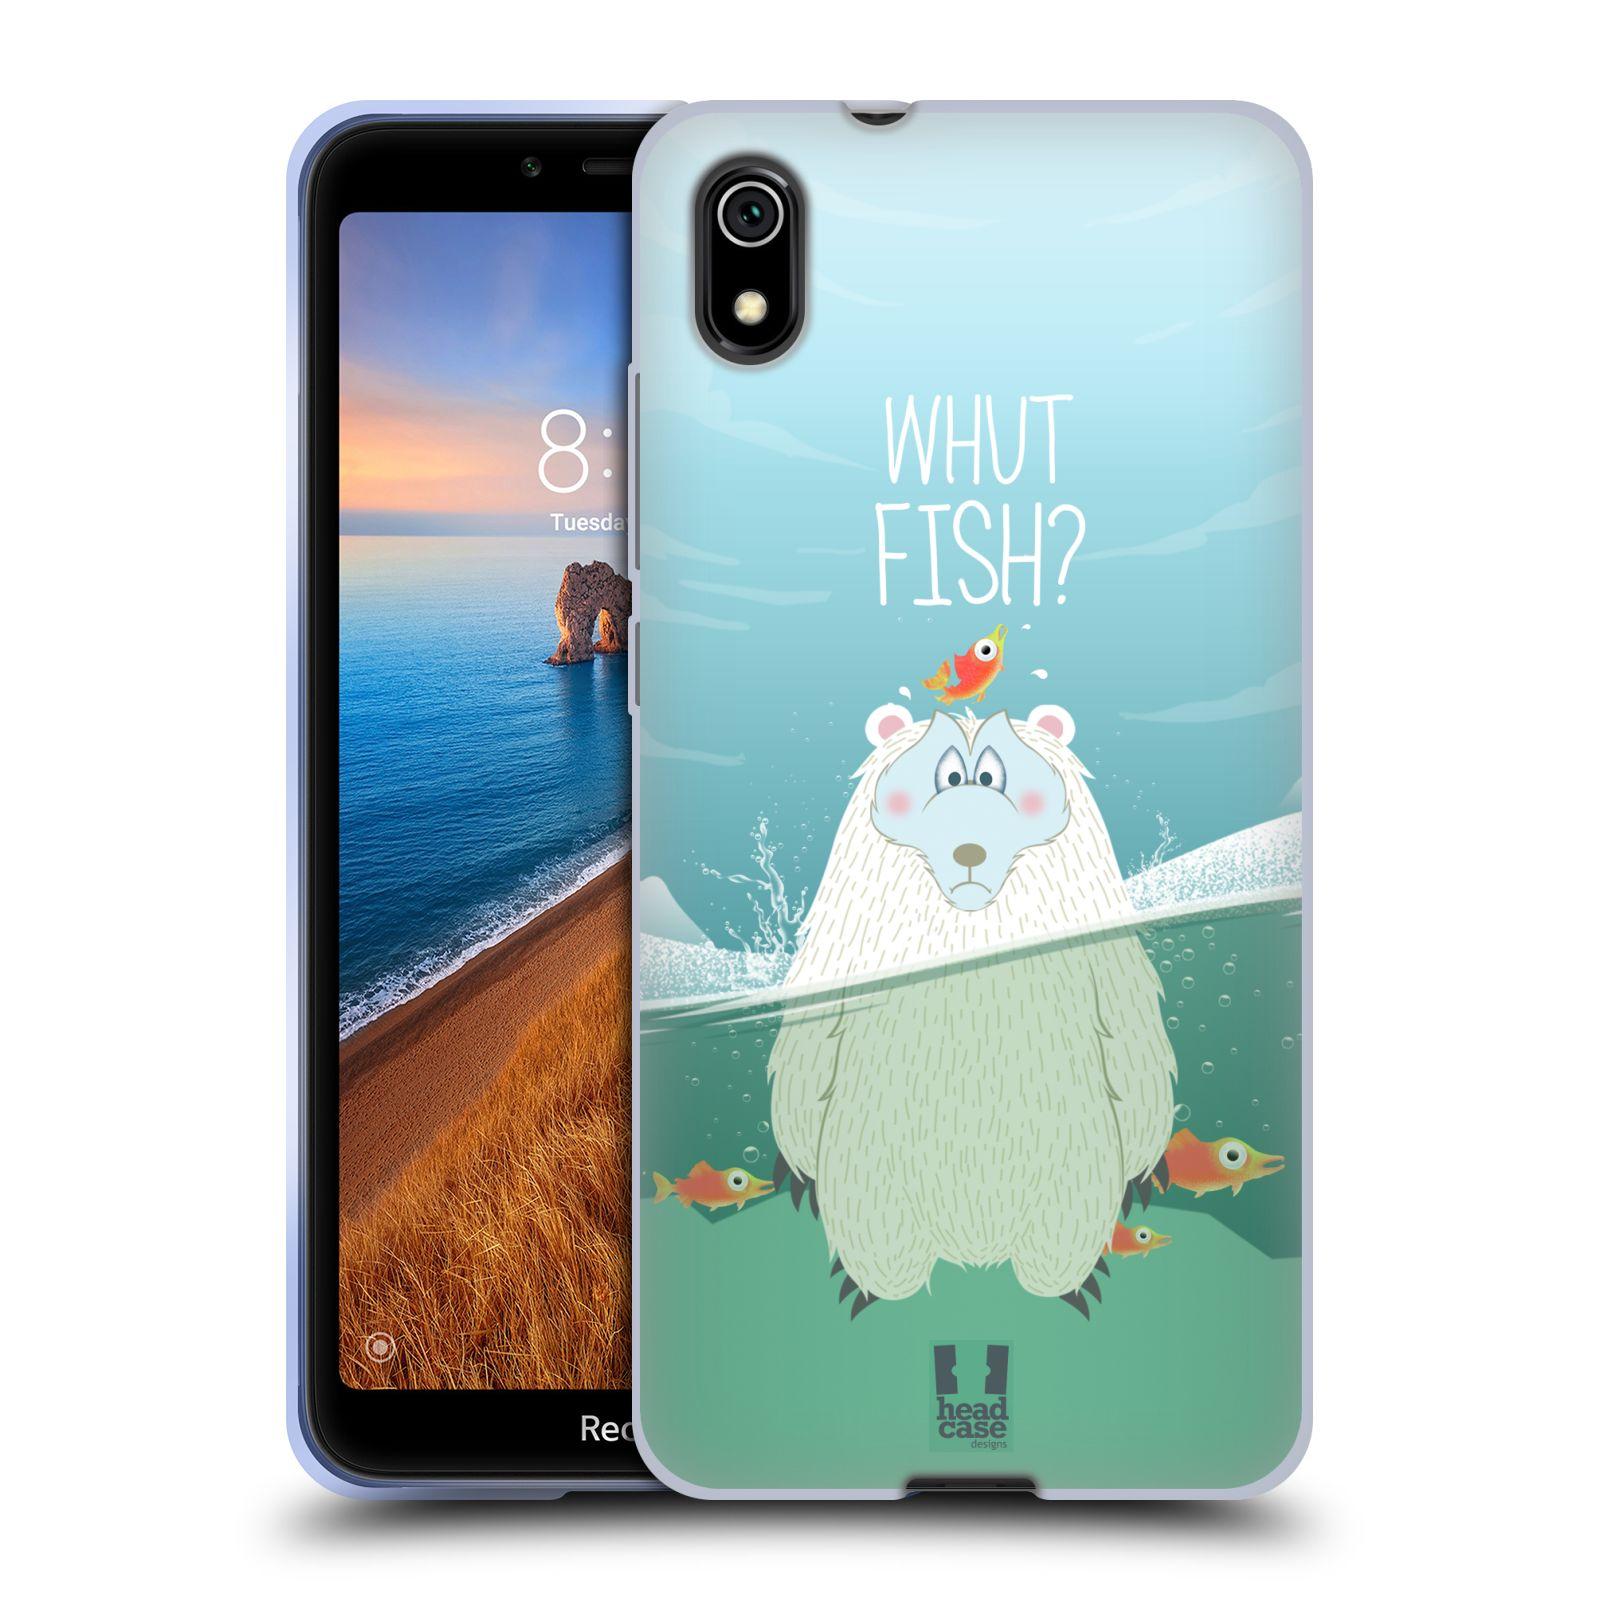 Silikonové pouzdro na mobil Redmi 7A - Head Case - Medvěd Whut Fish?